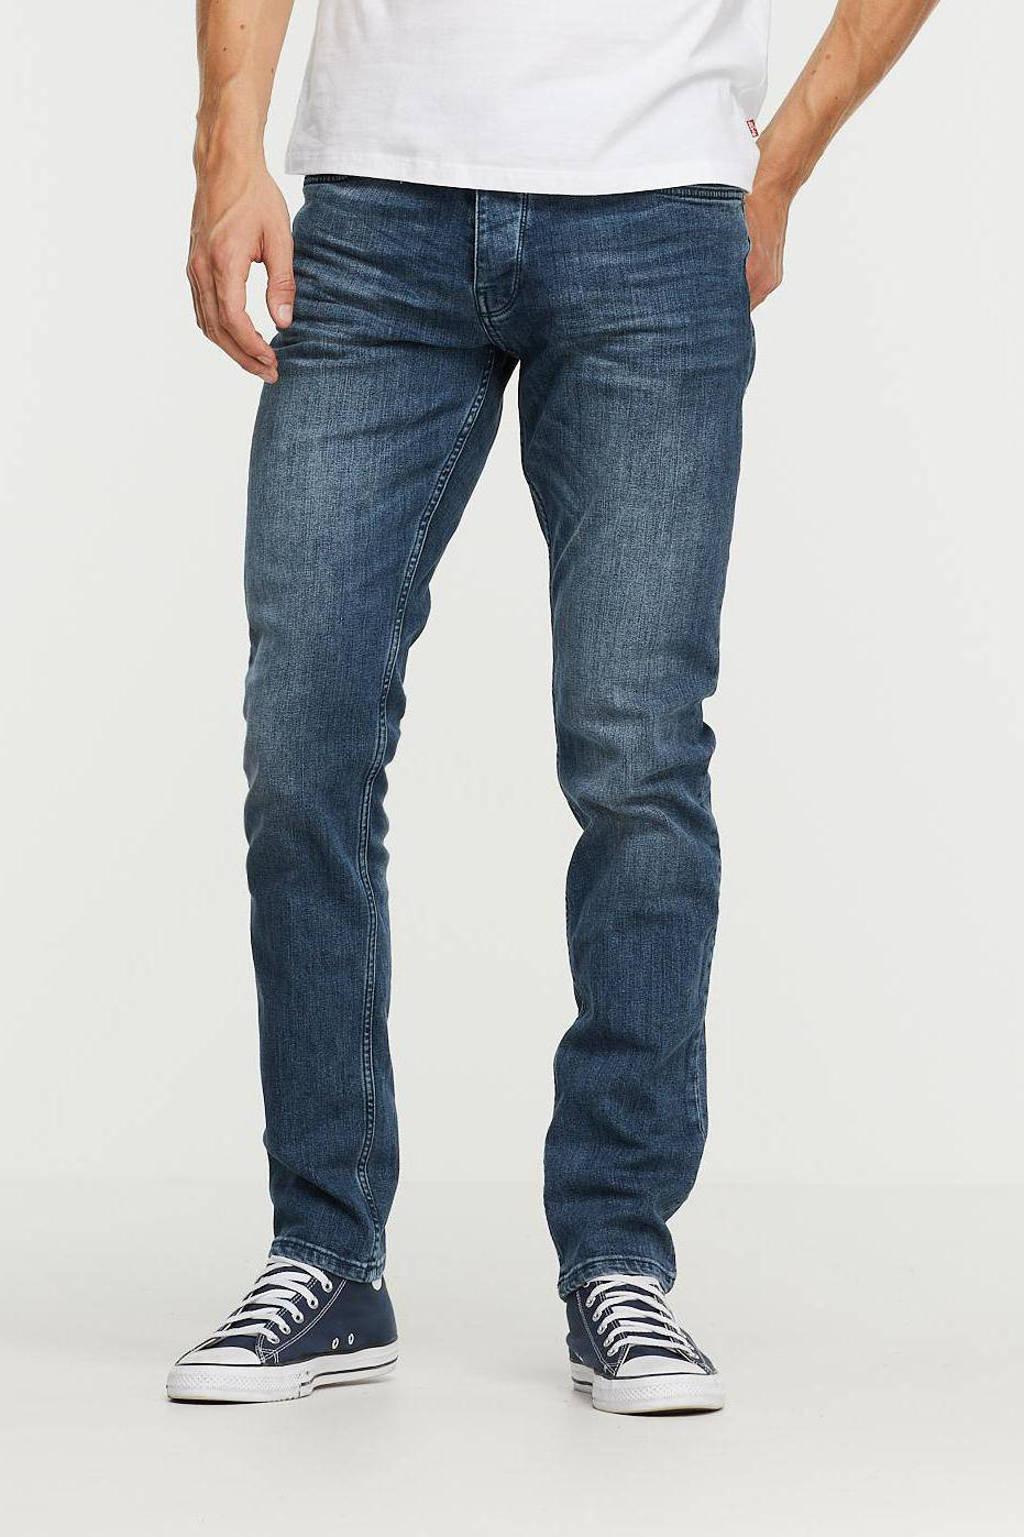 Purewhite slim fit jeans The Stan W0104 denim mid blue, Denim mid blue